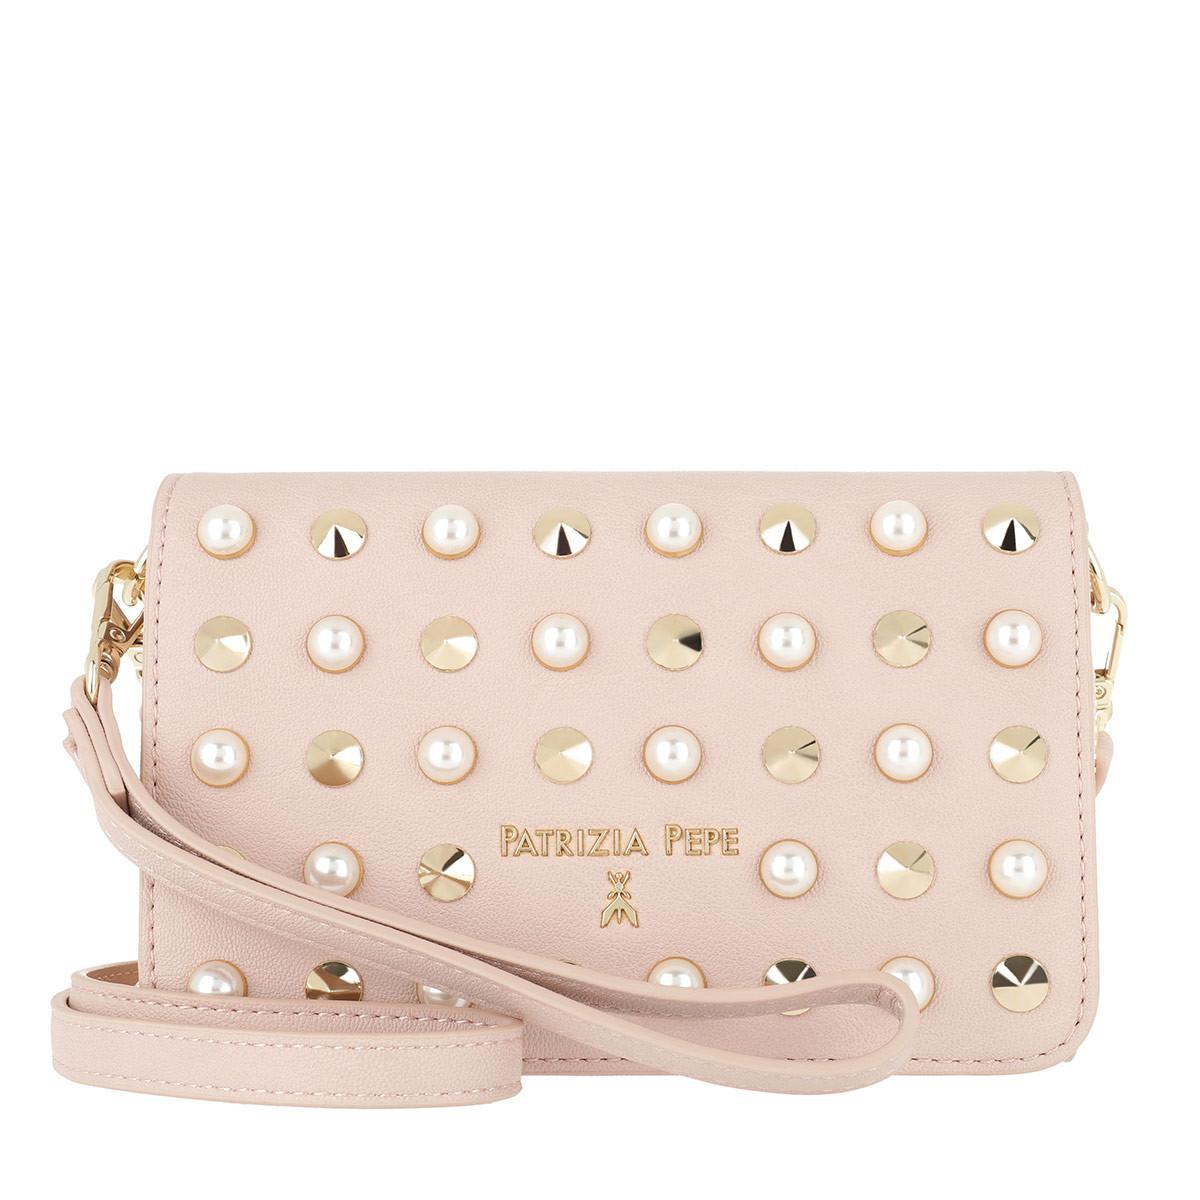 b796f65a3d Patrizia Pepe Patterned Crossbody Bag Rock Rose/pearl in Pink - Lyst